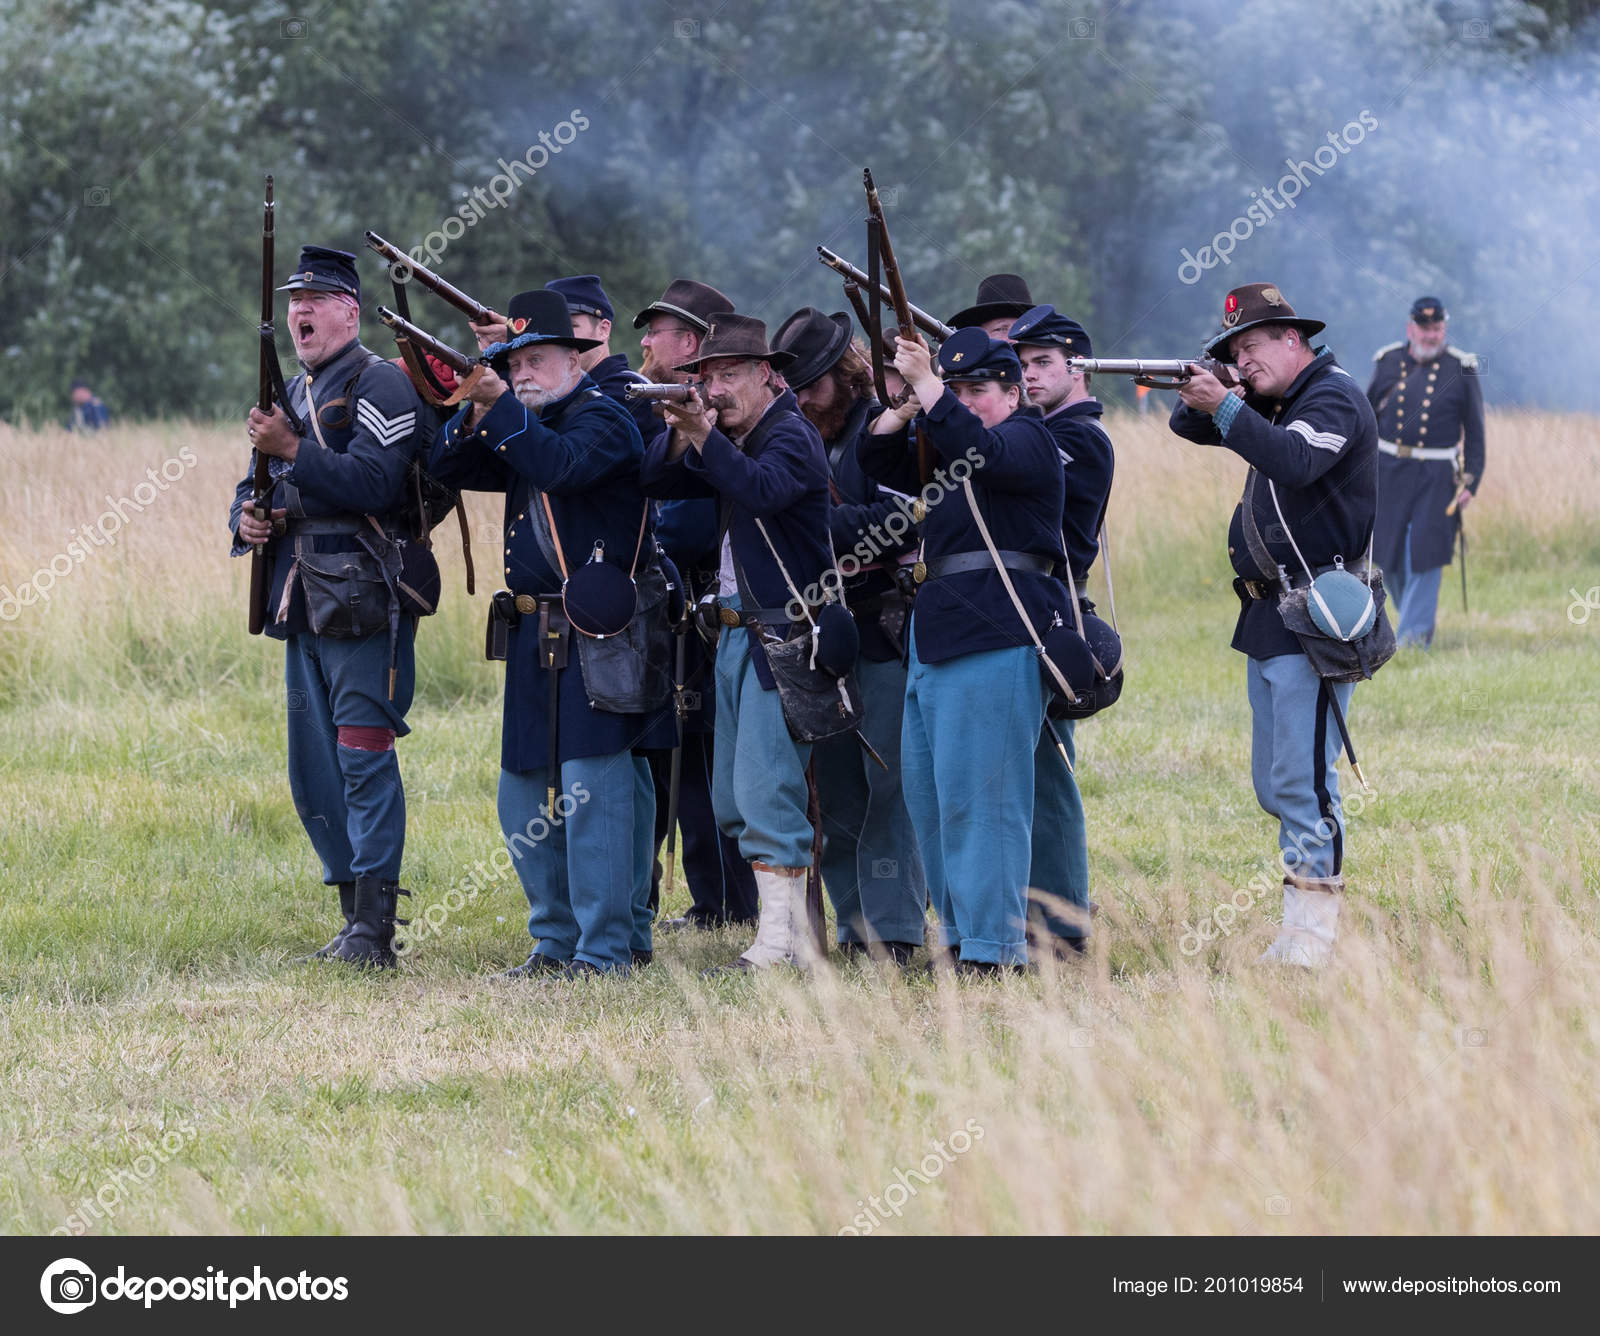 American Civil War Reenactment Soldiers Fight Combat